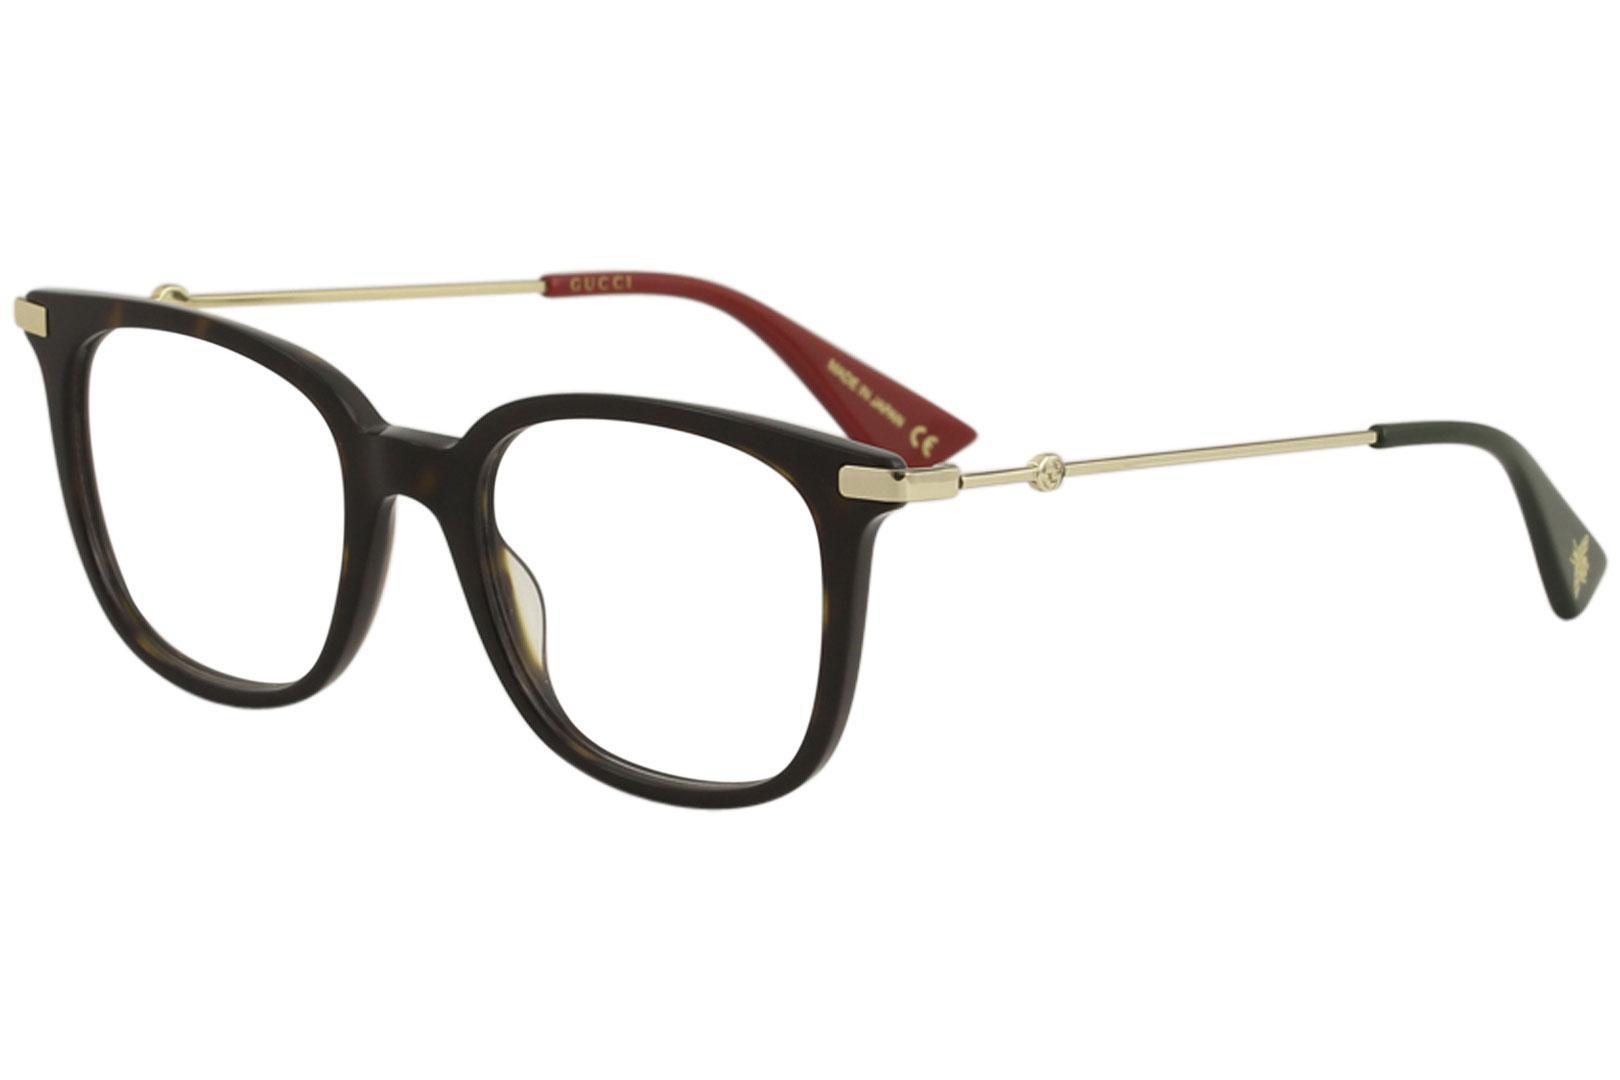 d21827ab66 Gucci Women s Eyeglasses GG0110O GG 0110 O Full Rim Optical Frame by Gucci